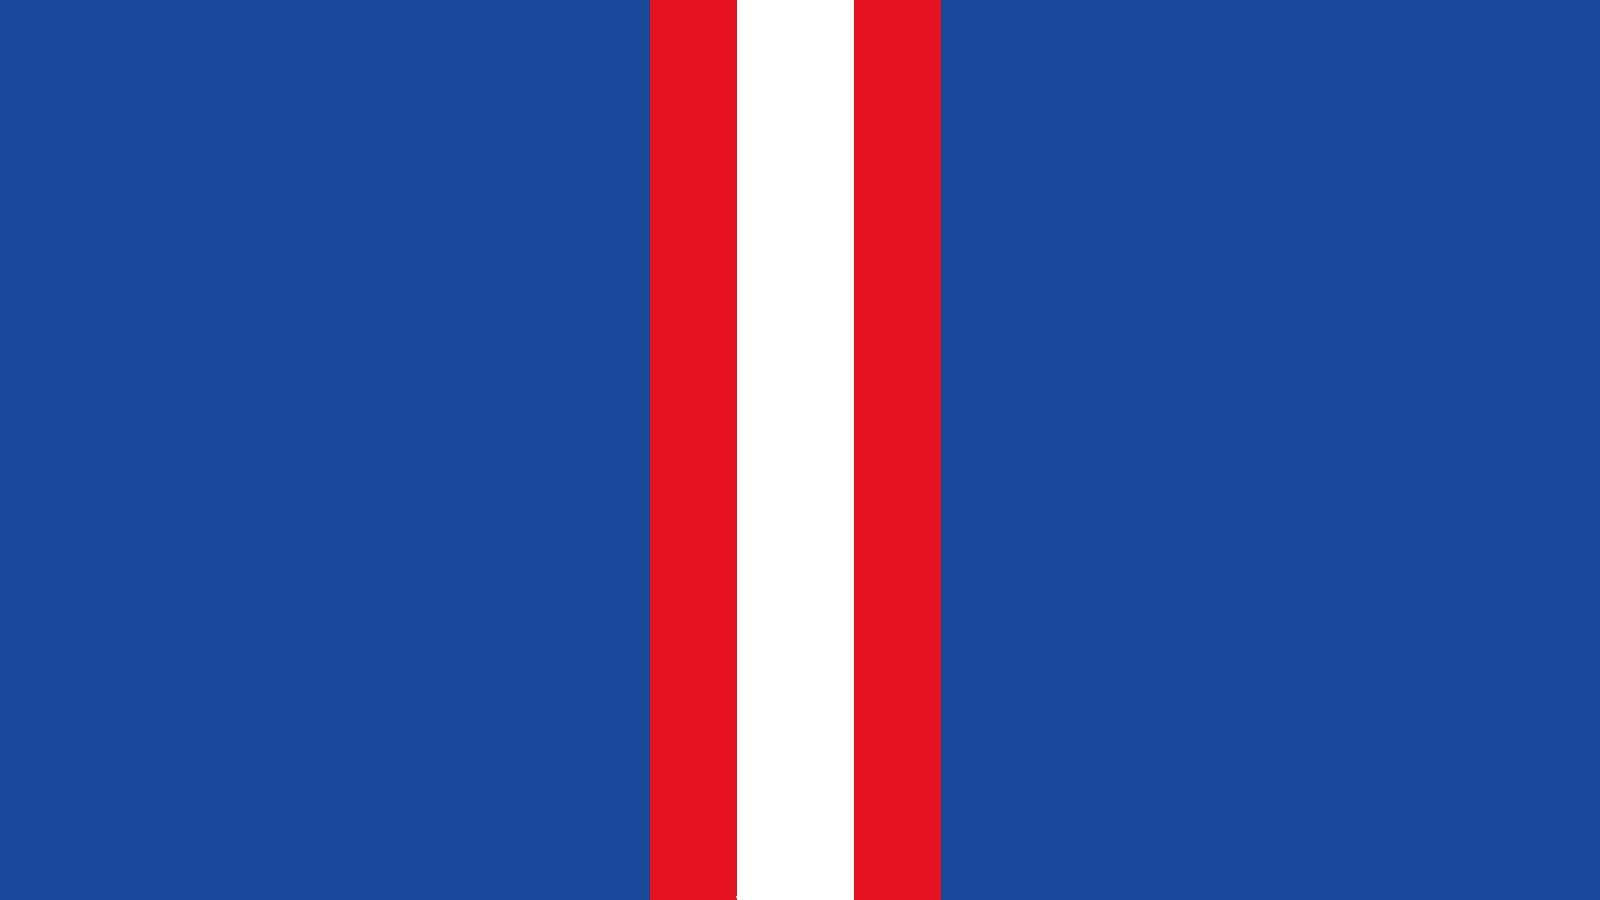 Texas Longhorns at Kansas Jayhawks (Reduced Capacity, Social Distancing)